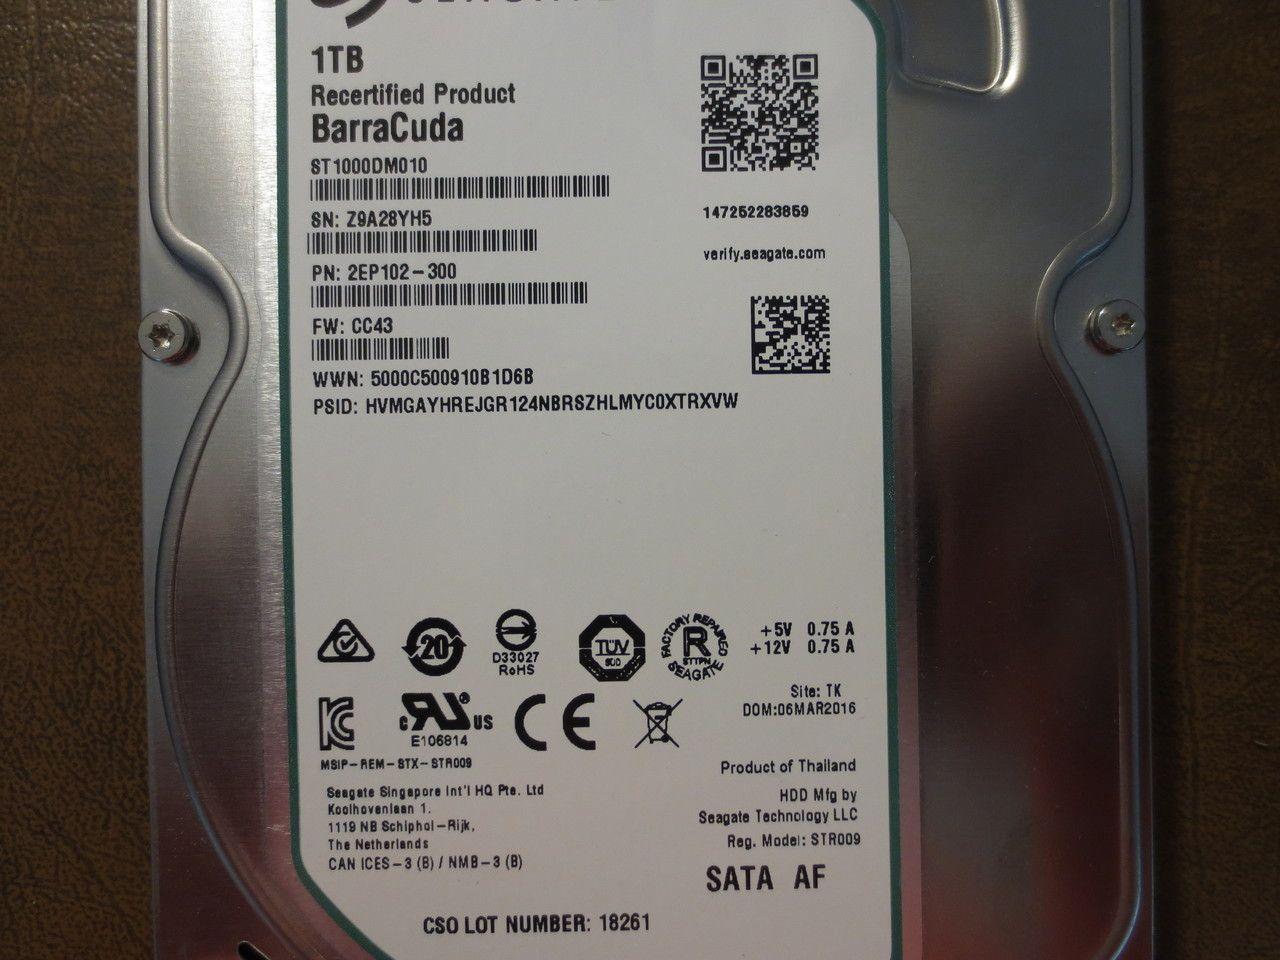 Seagate St1000dm010 2ep102 300 Fw Cc43 Tk 1 0tb Sata Seagate Computer Repair Data Recovery